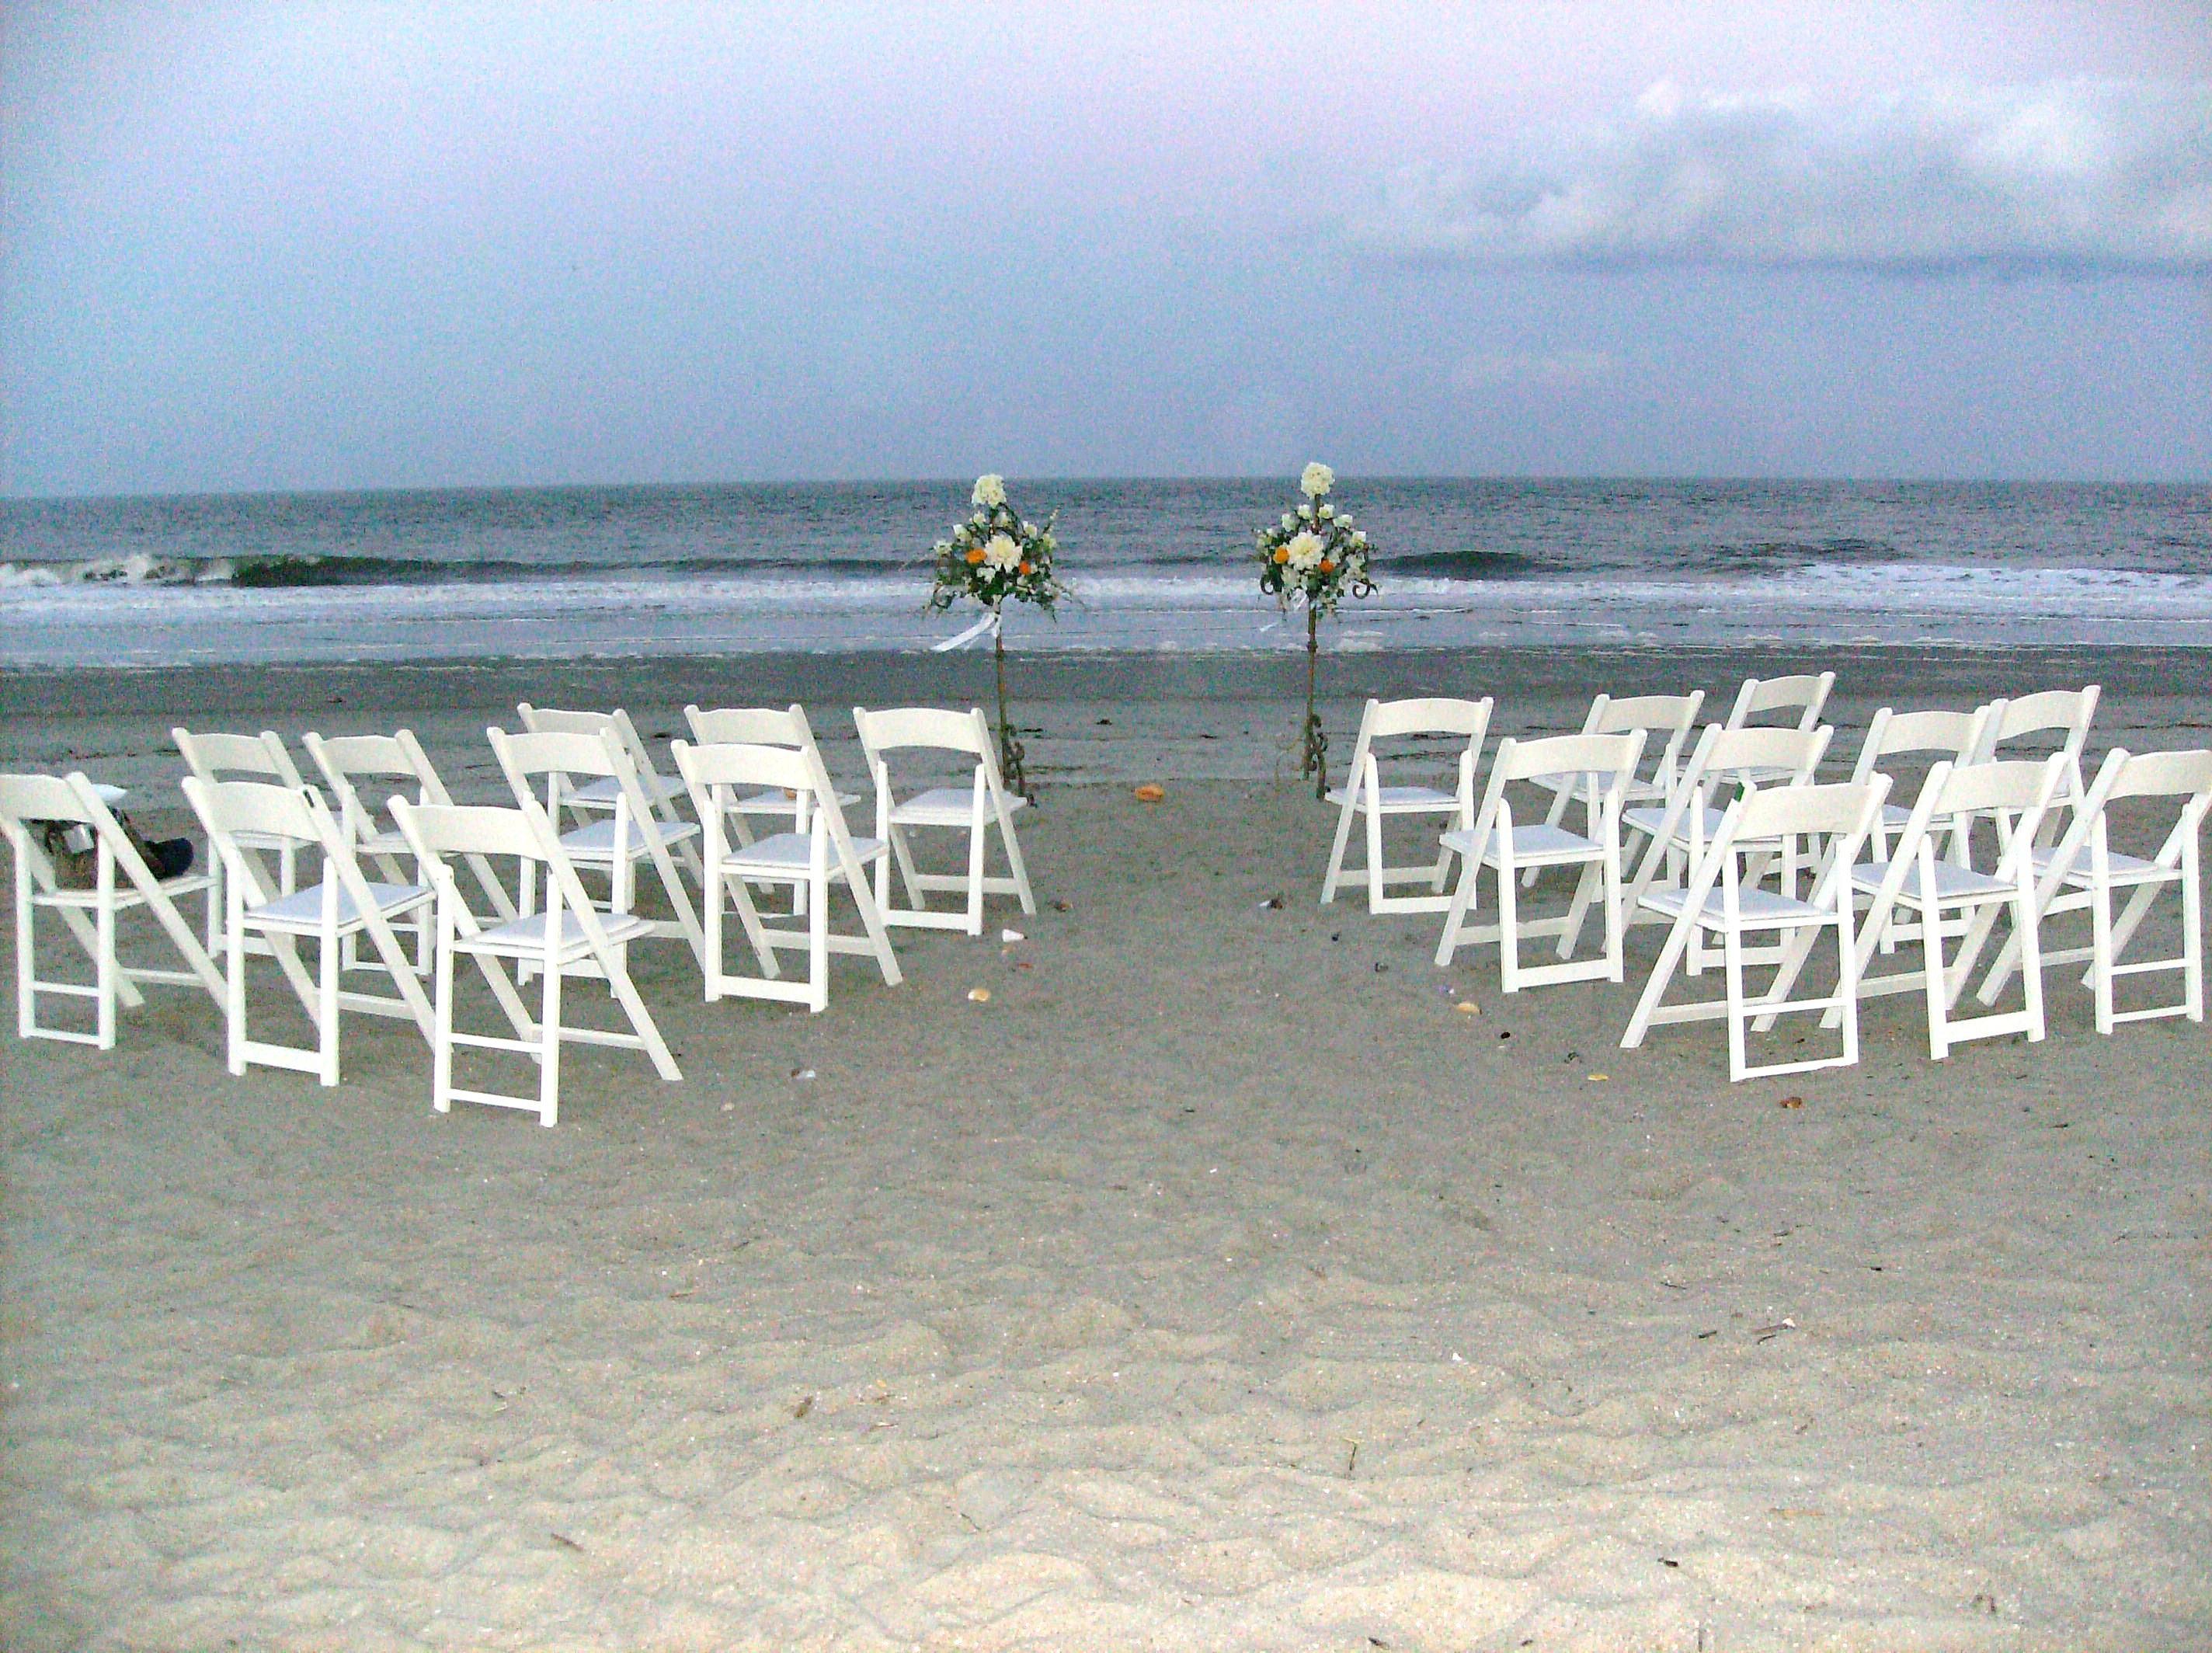 2481ac 01a7f612572916dbecfc6bcdf95a9cec.jpg srz 2848 2128 85 22 0.50 1.20 0 - savannah ga beach wedding